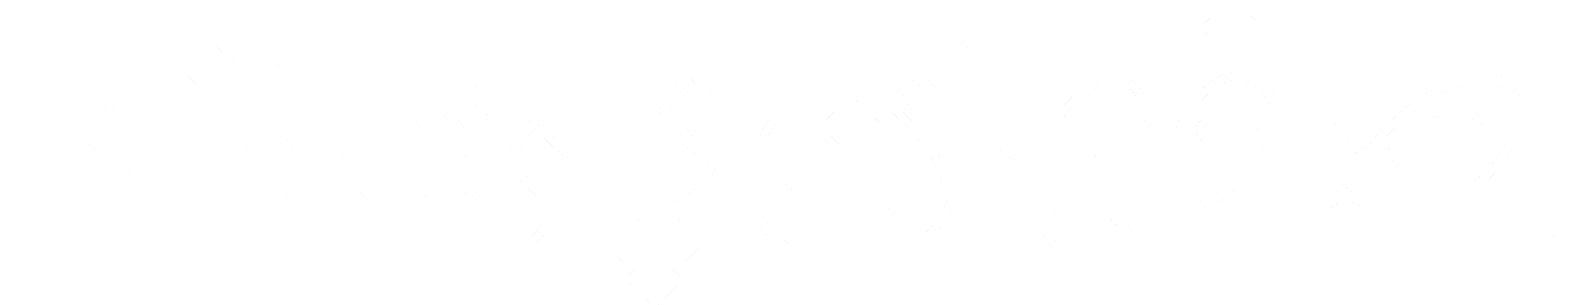 اصفهان پرستار لوگو